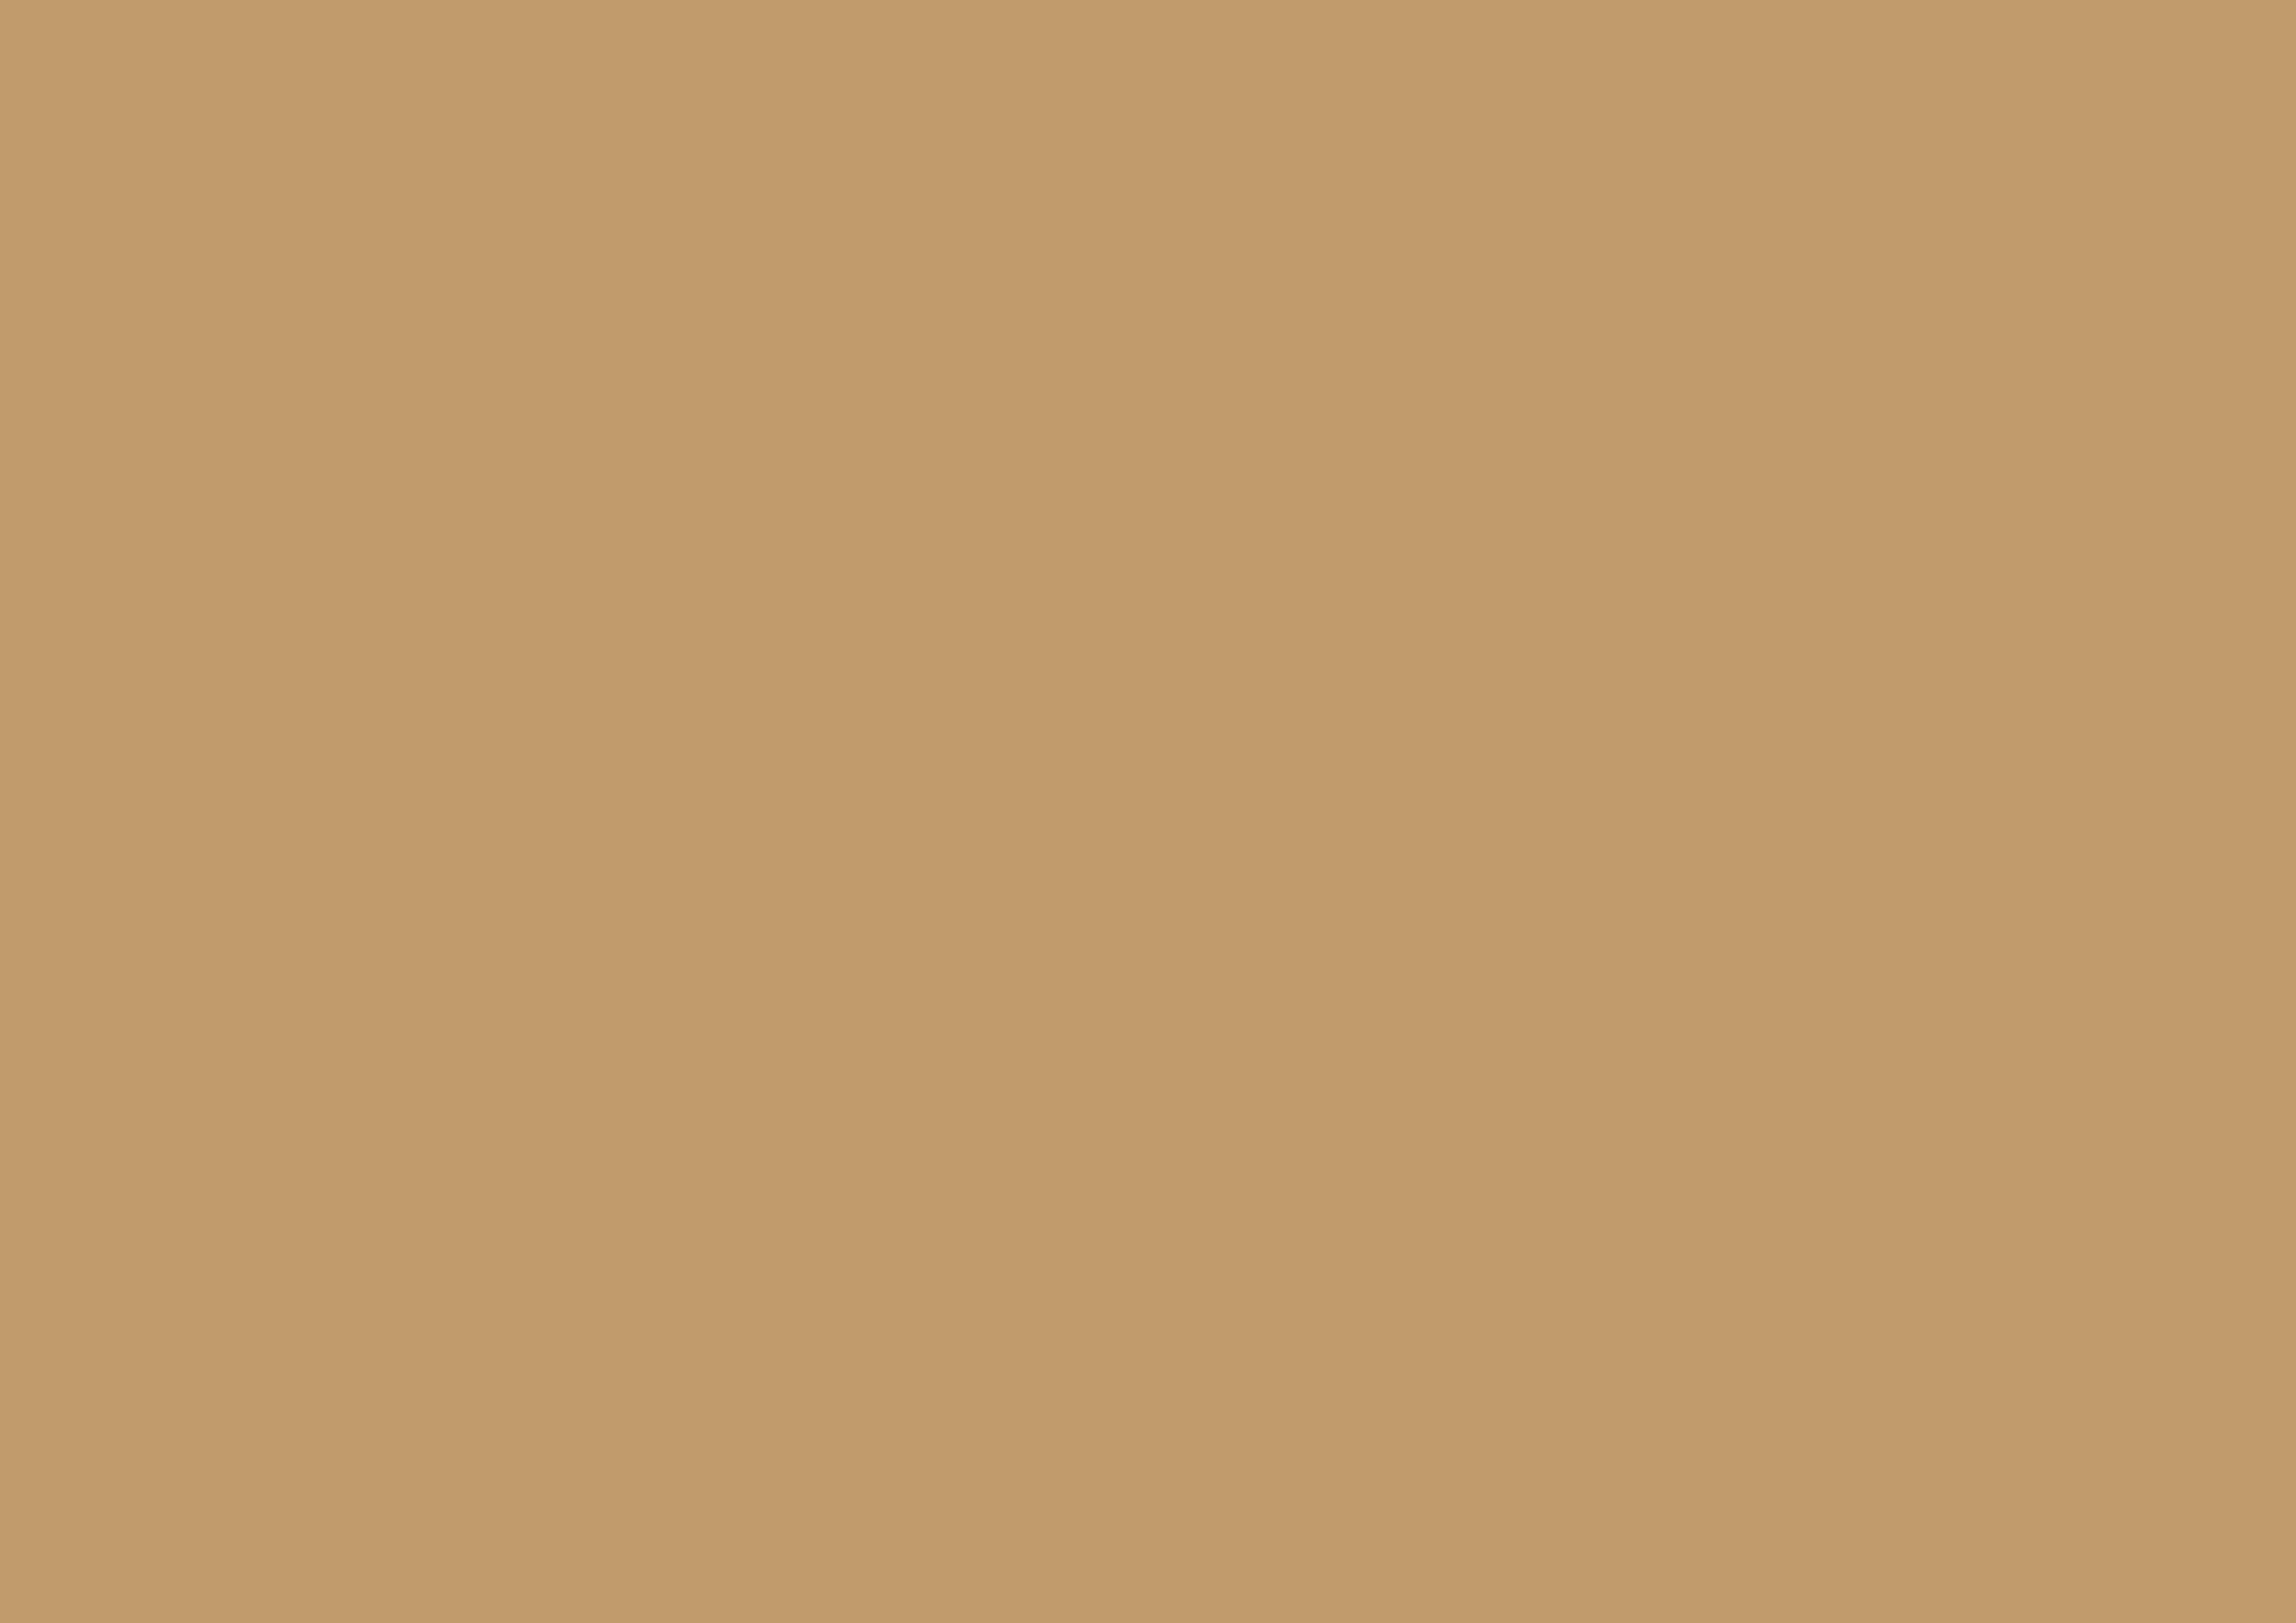 3508x2480 Desert Solid Color Background